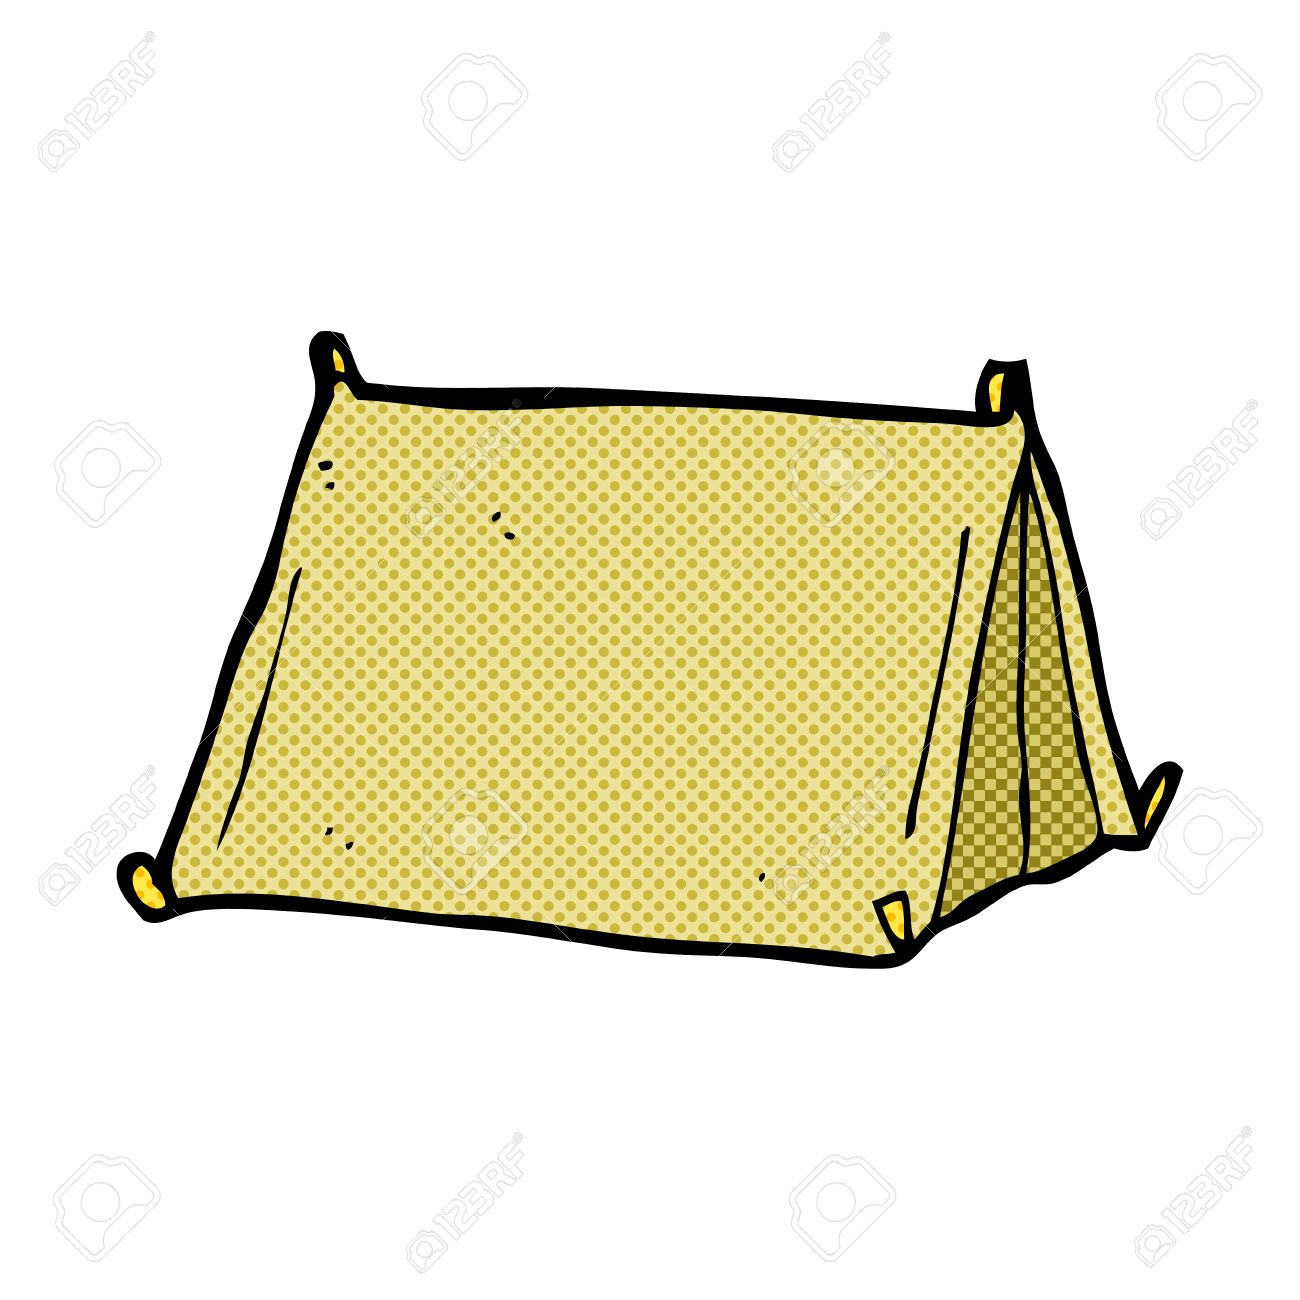 retro comic book style cartoon traditional tent Stock Vector - 36705450  sc 1 st  123RF Stock Photos & Retro Comic Book Style Cartoon Traditional Tent Royalty Free ...